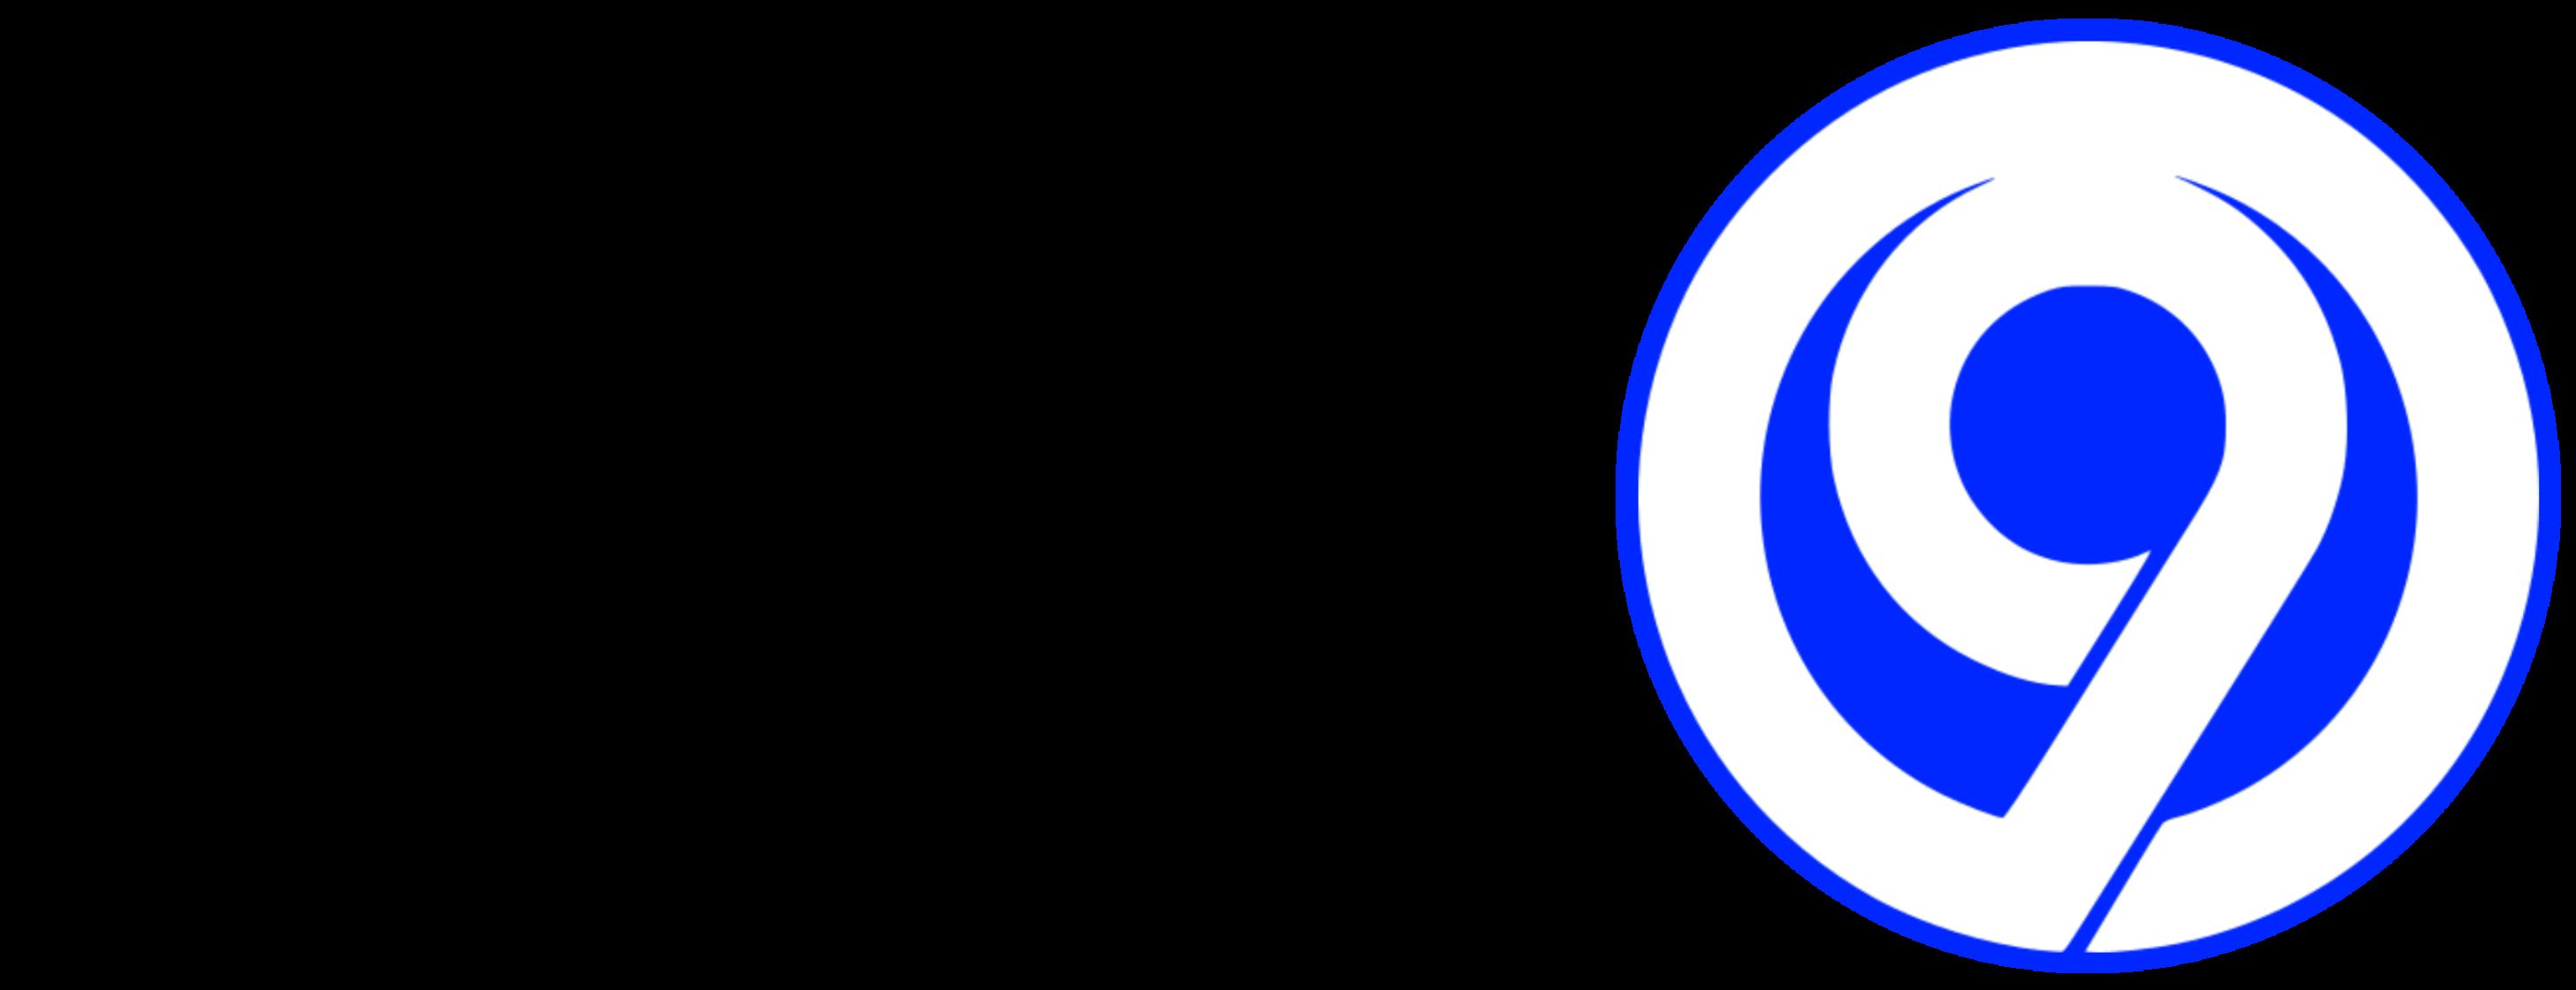 AlternateHistory.com's KRAI logo #1.png